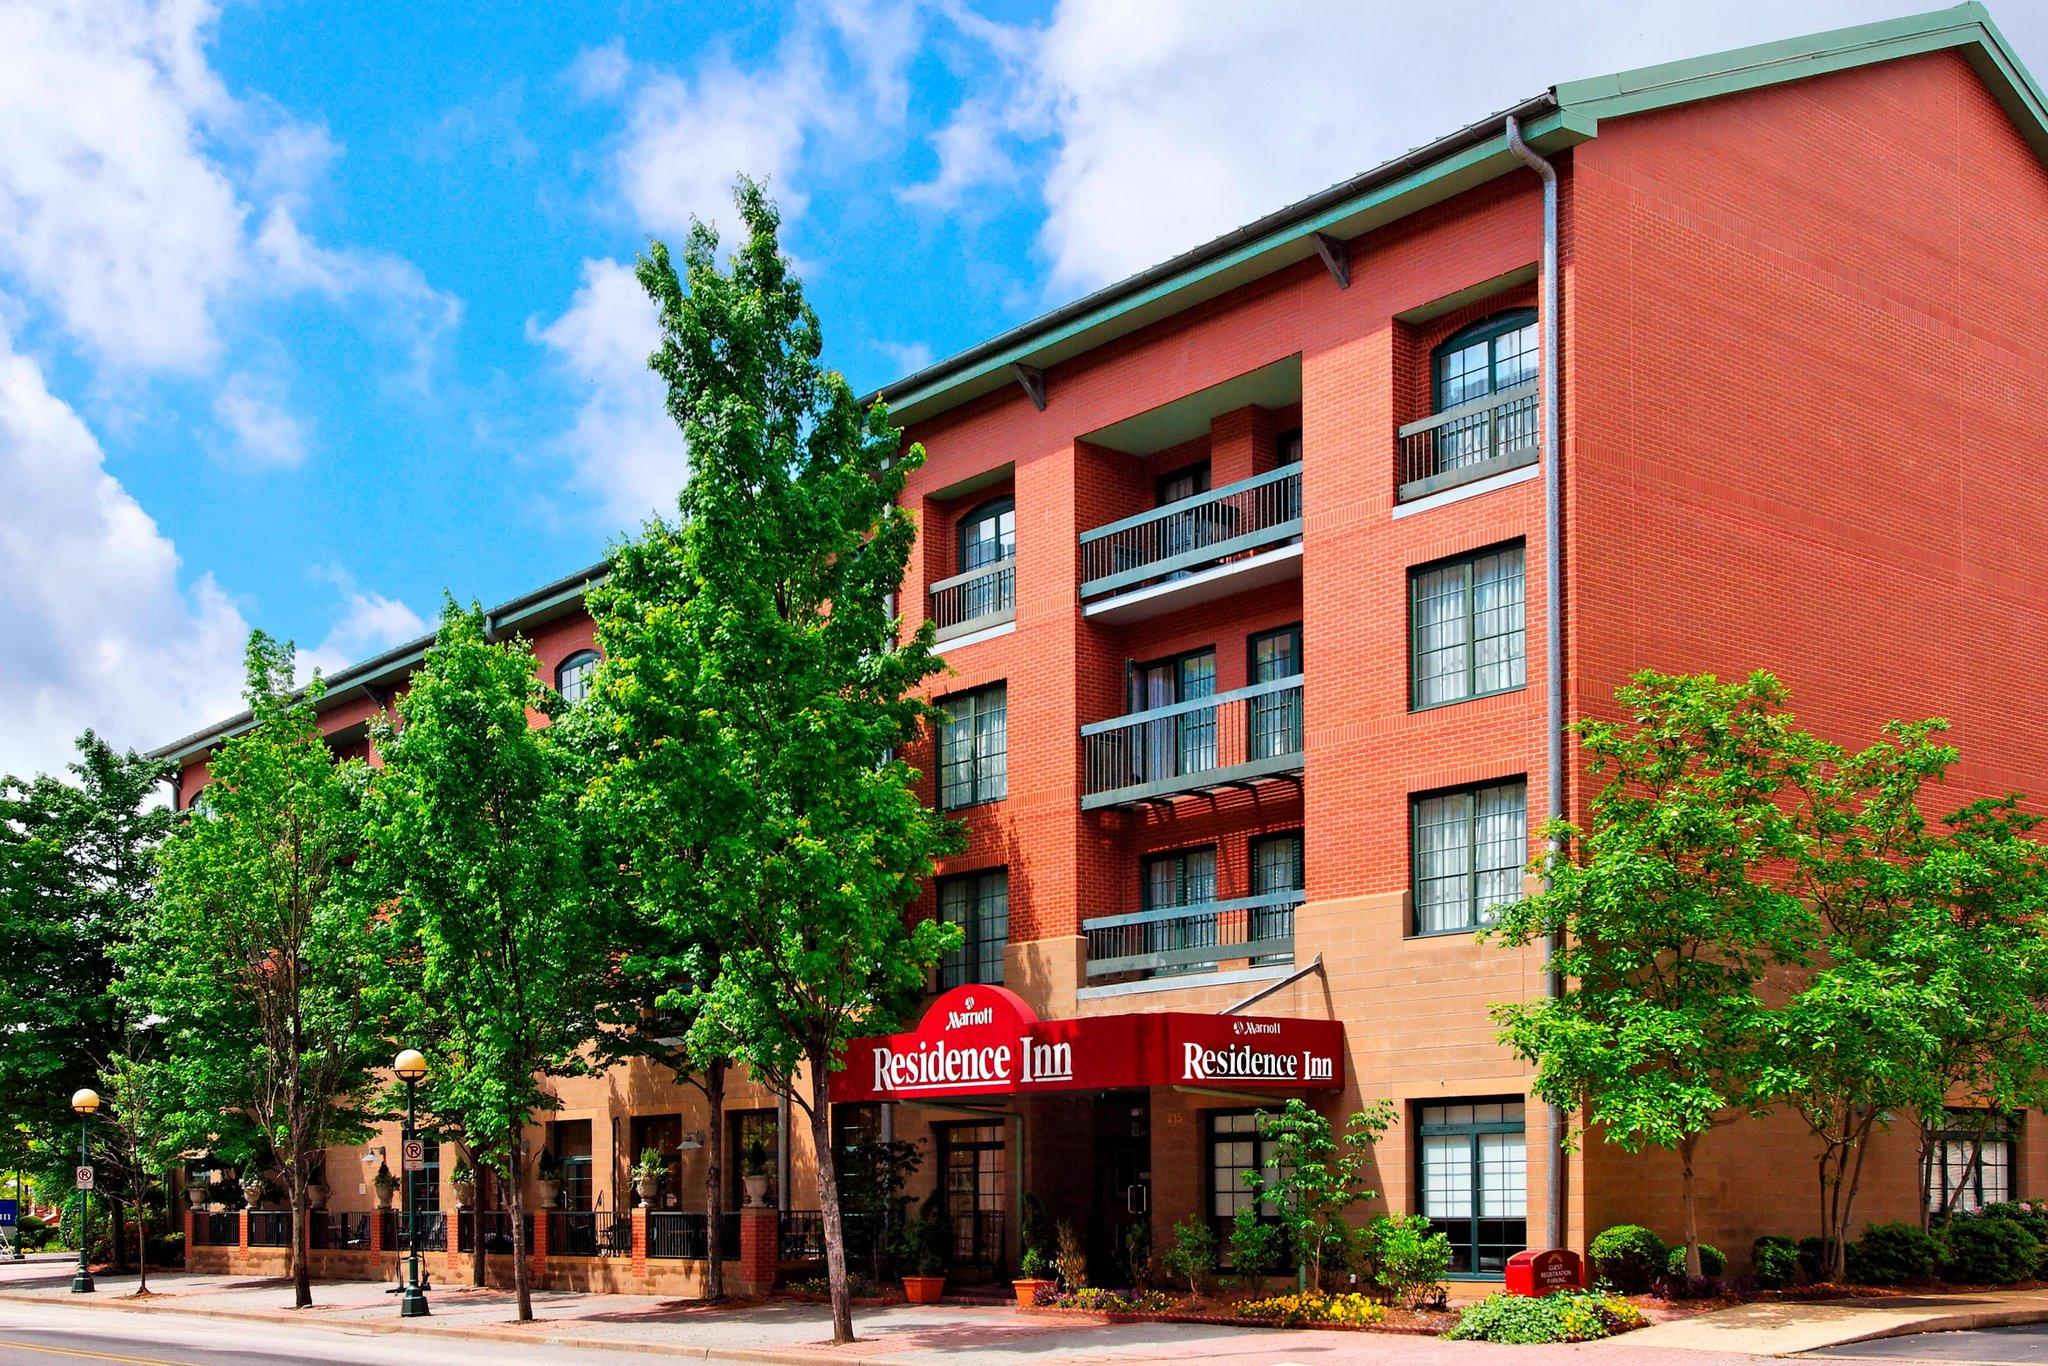 Residence Inn Chattanooga Downtown